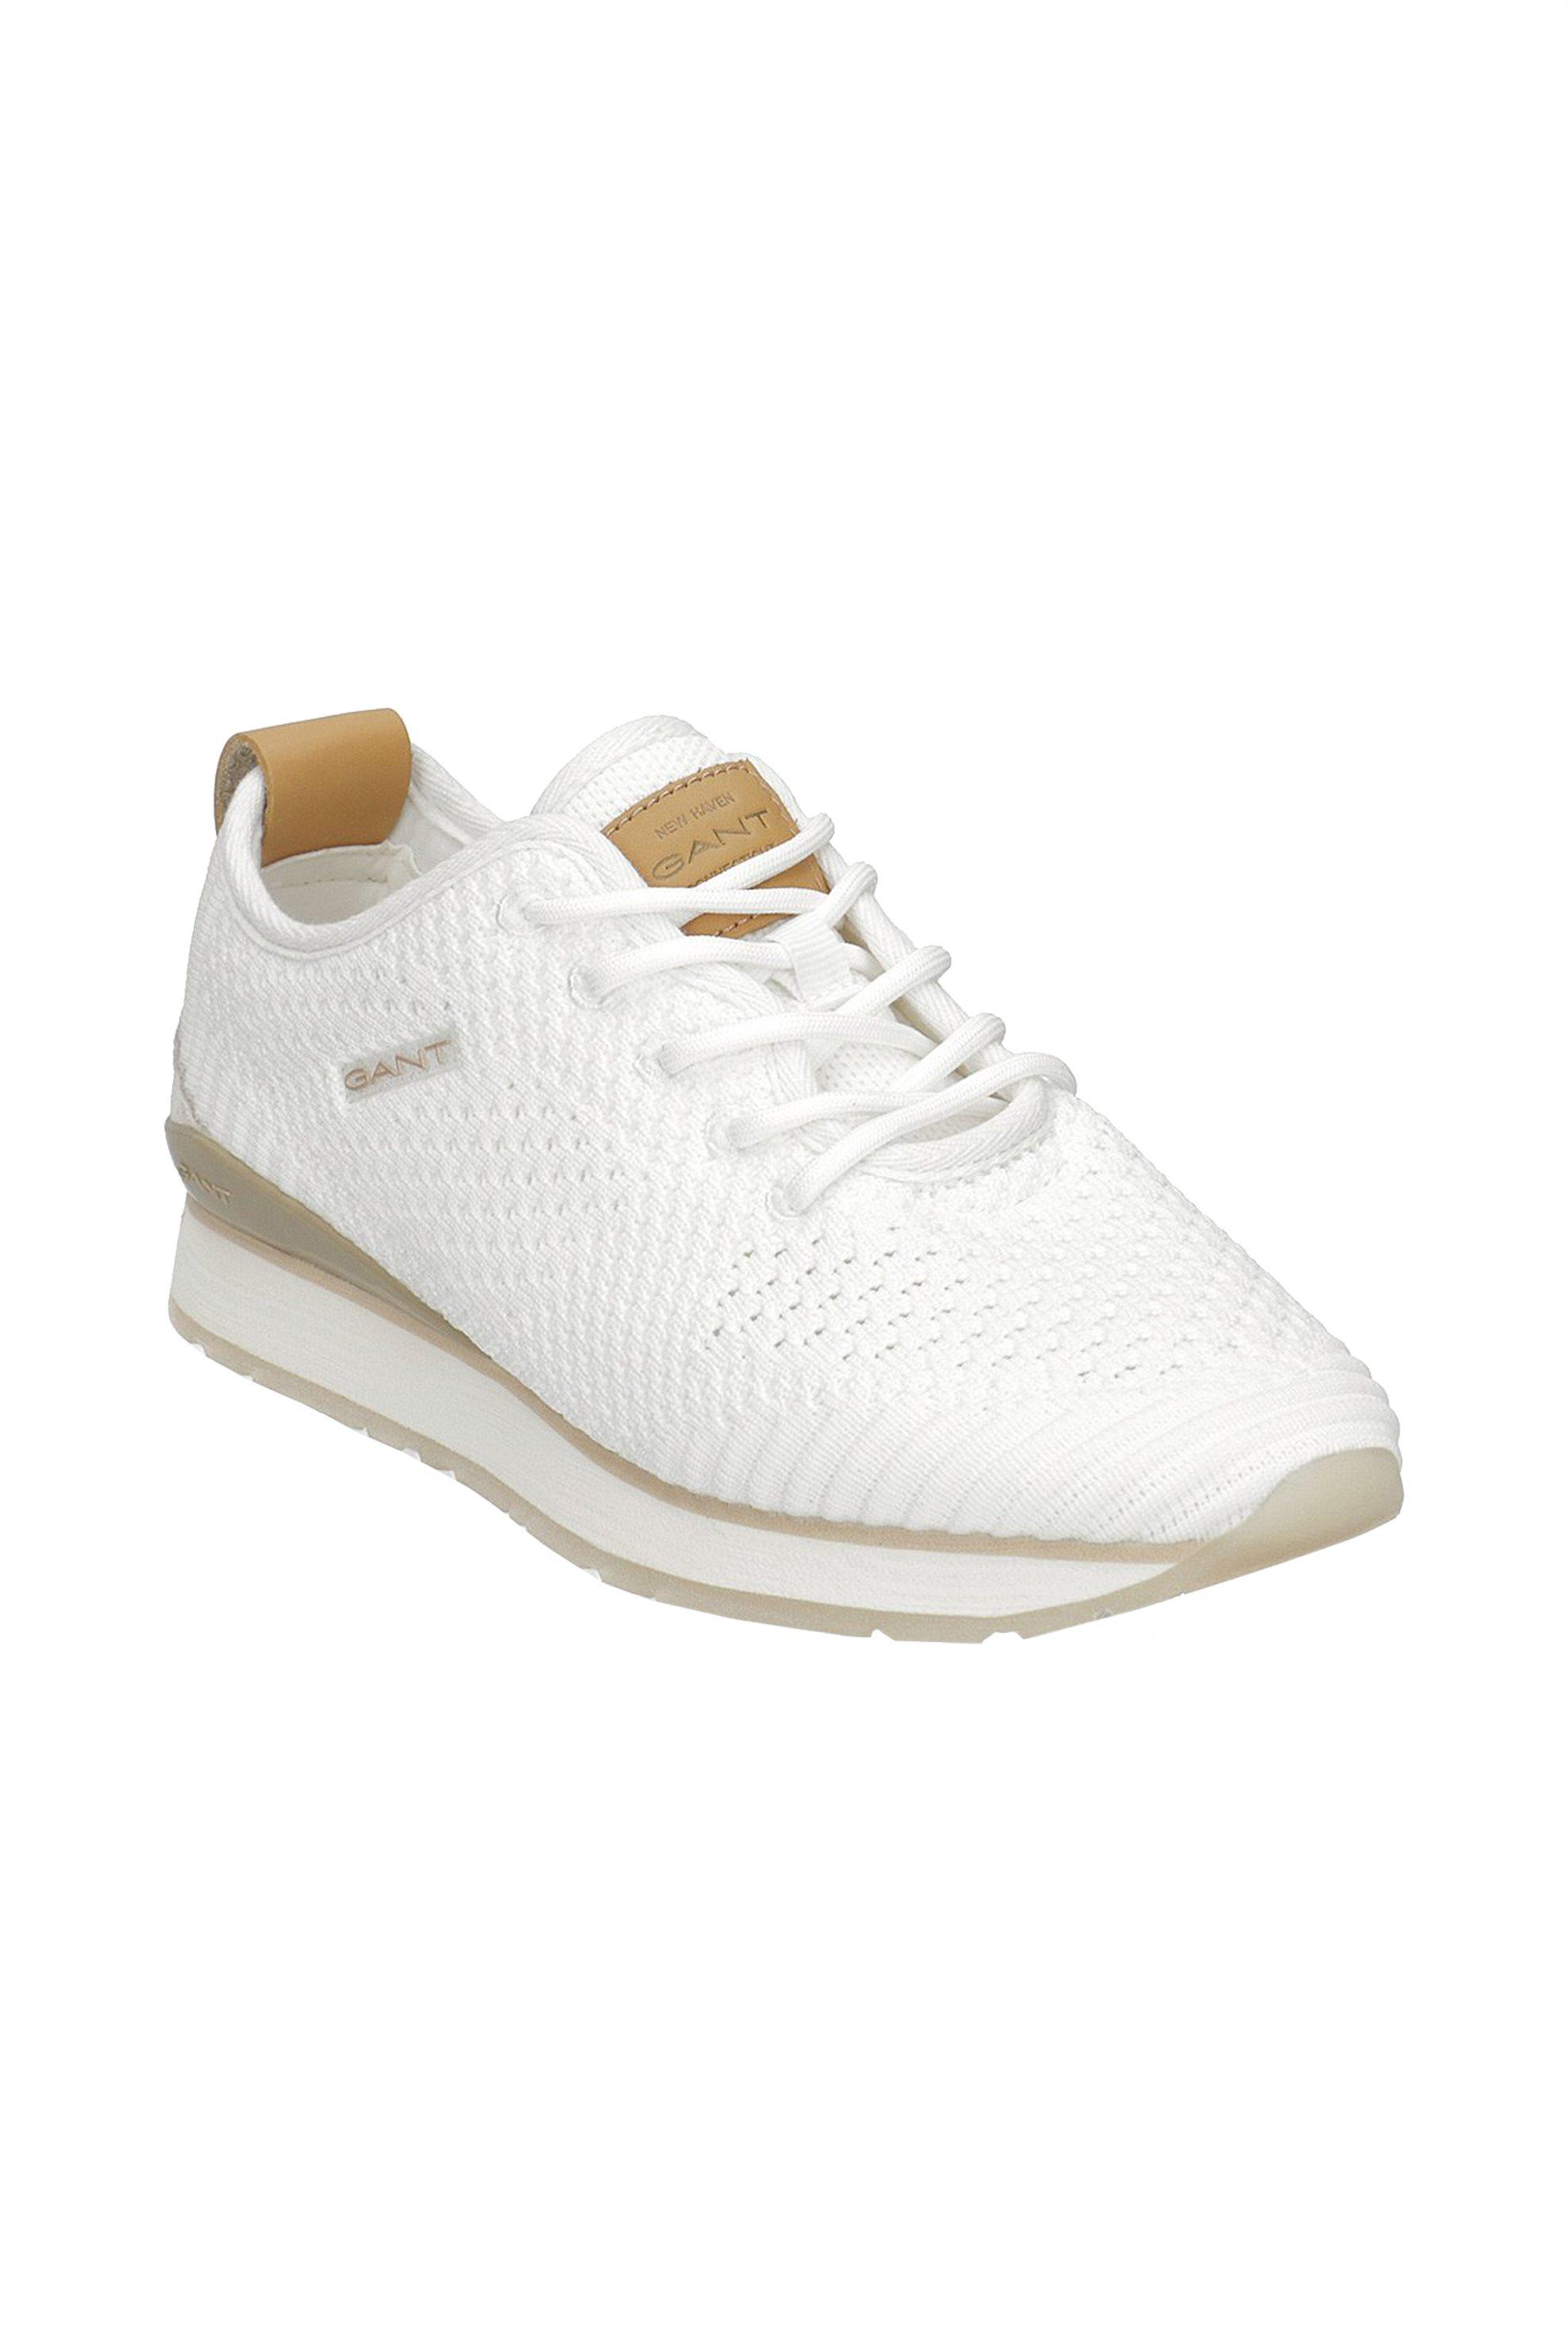 "Gant γυναικεία sneakers με κορδόνια ""Bevinda"" – 20538480 – Λευκό"